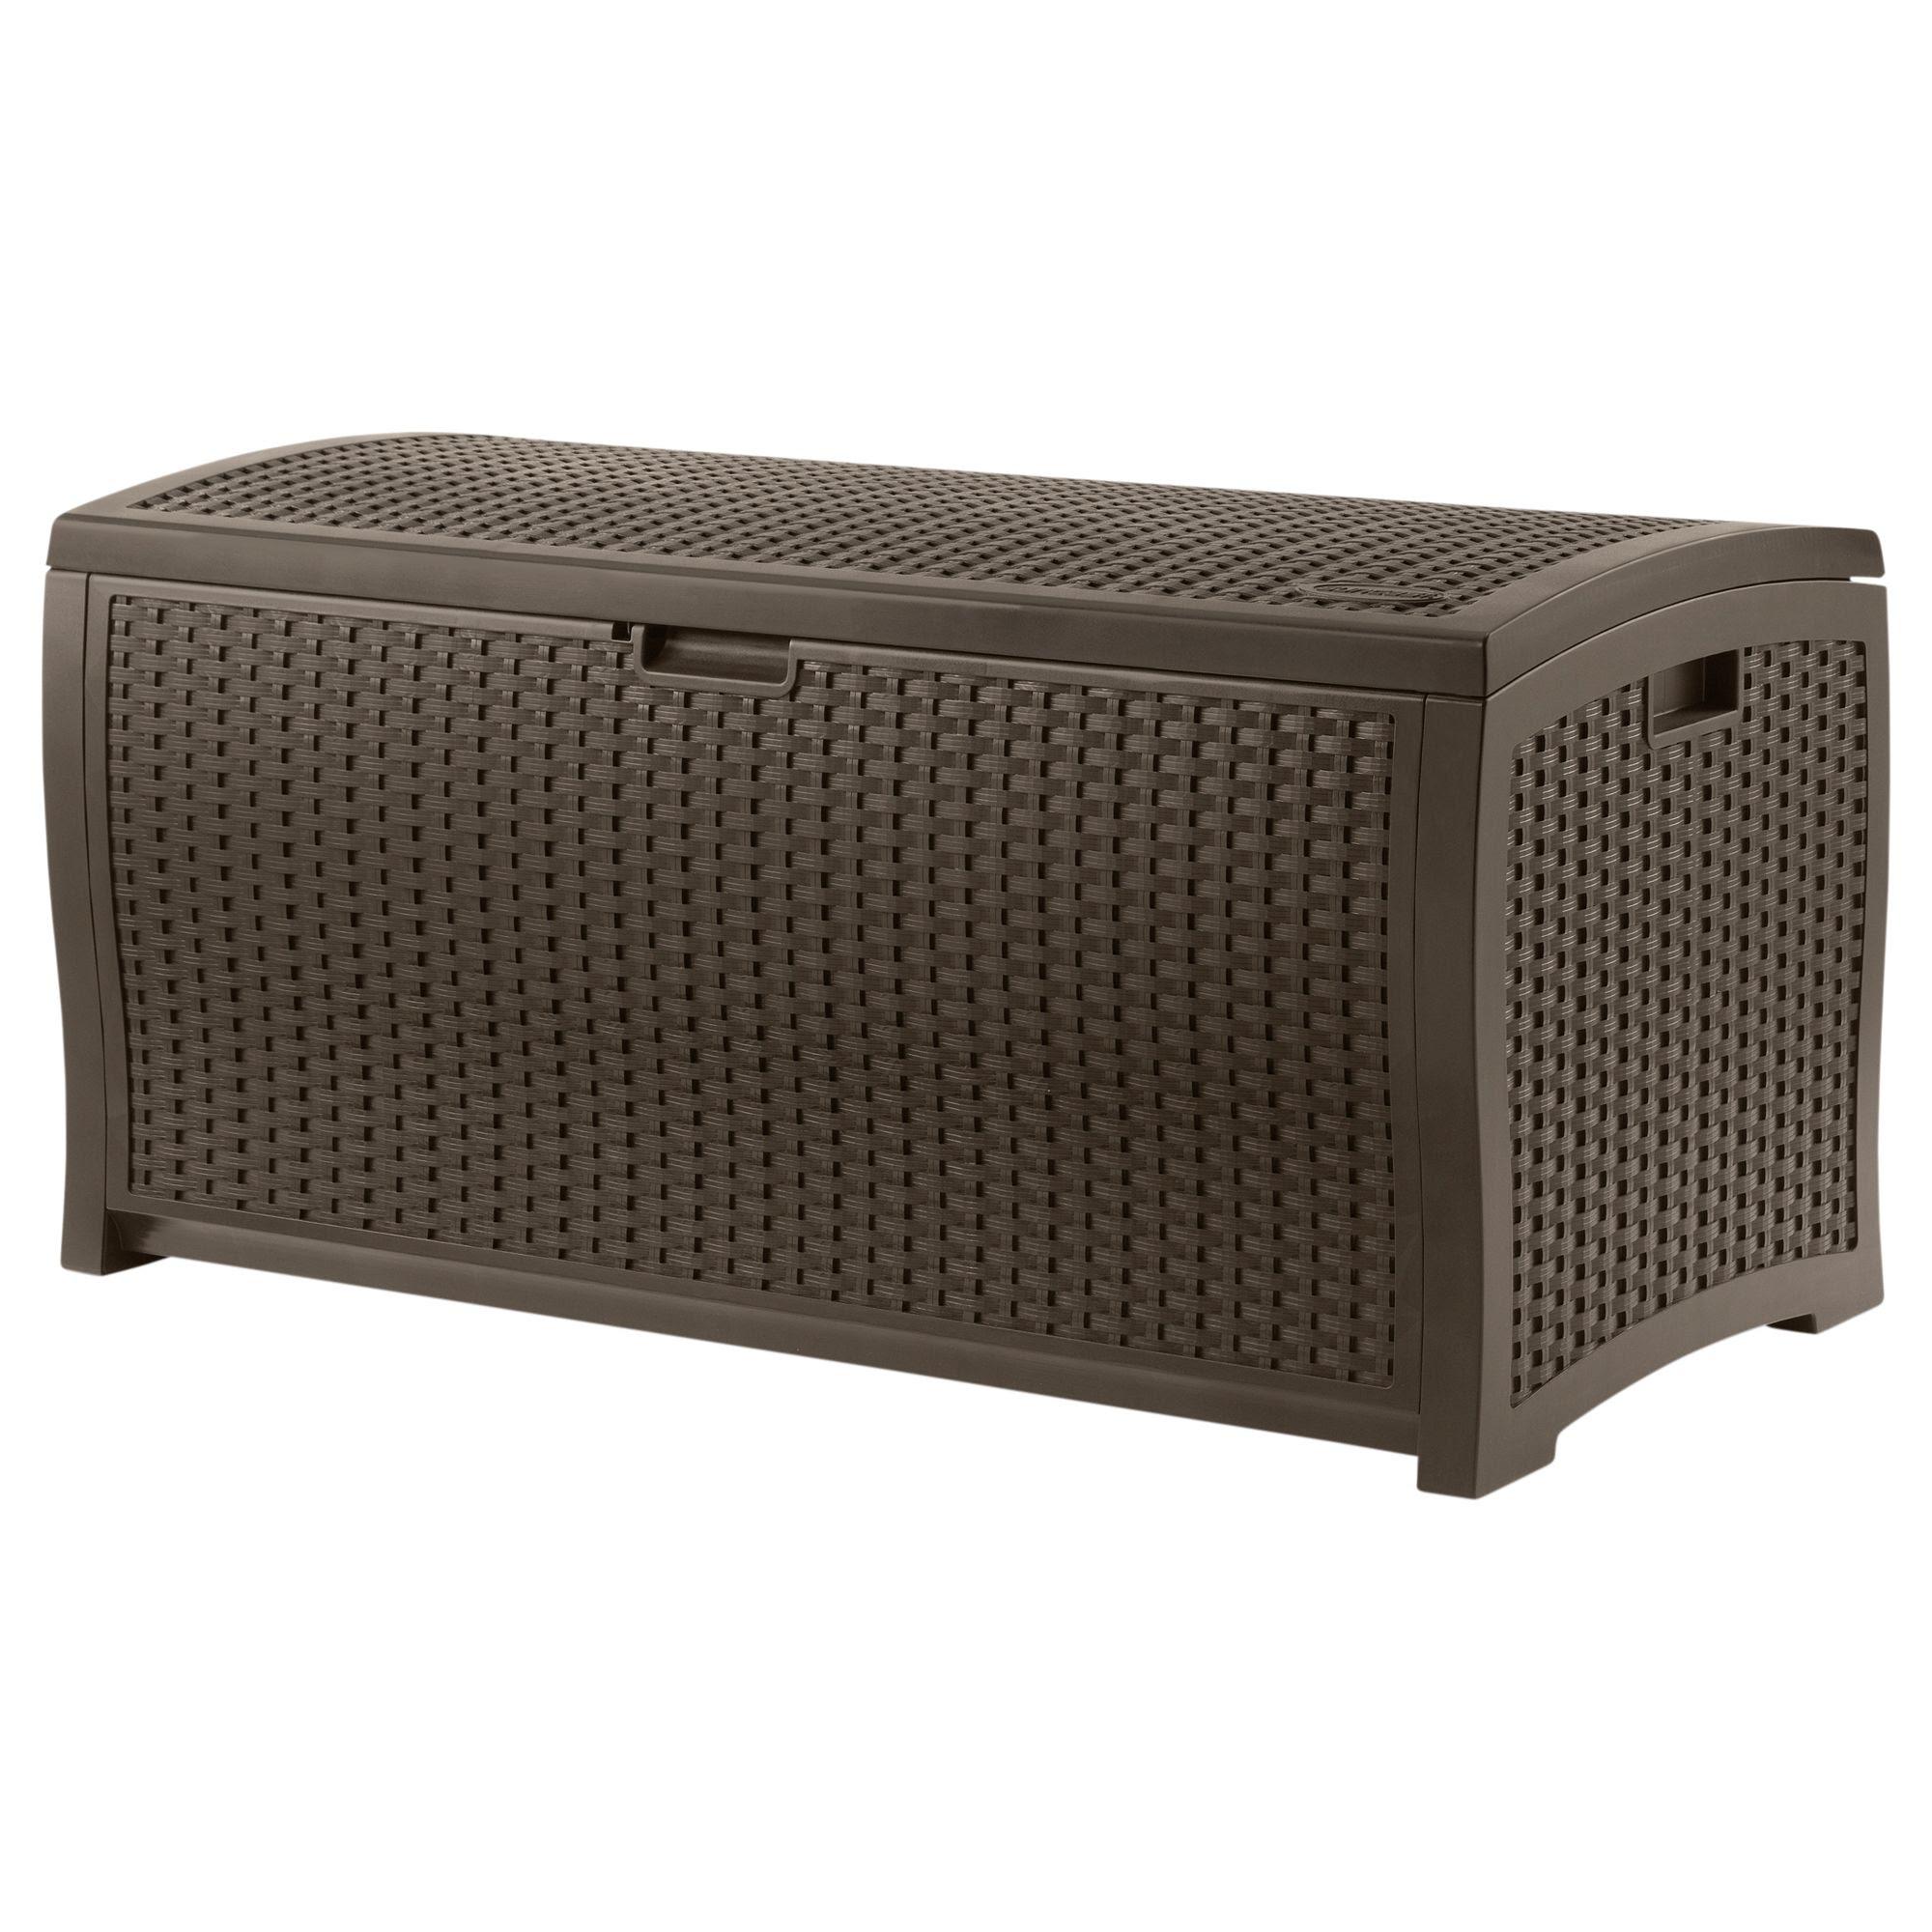 Suncast 99 Gallon Resin Wicker Deck Box - Outdoor Living ...